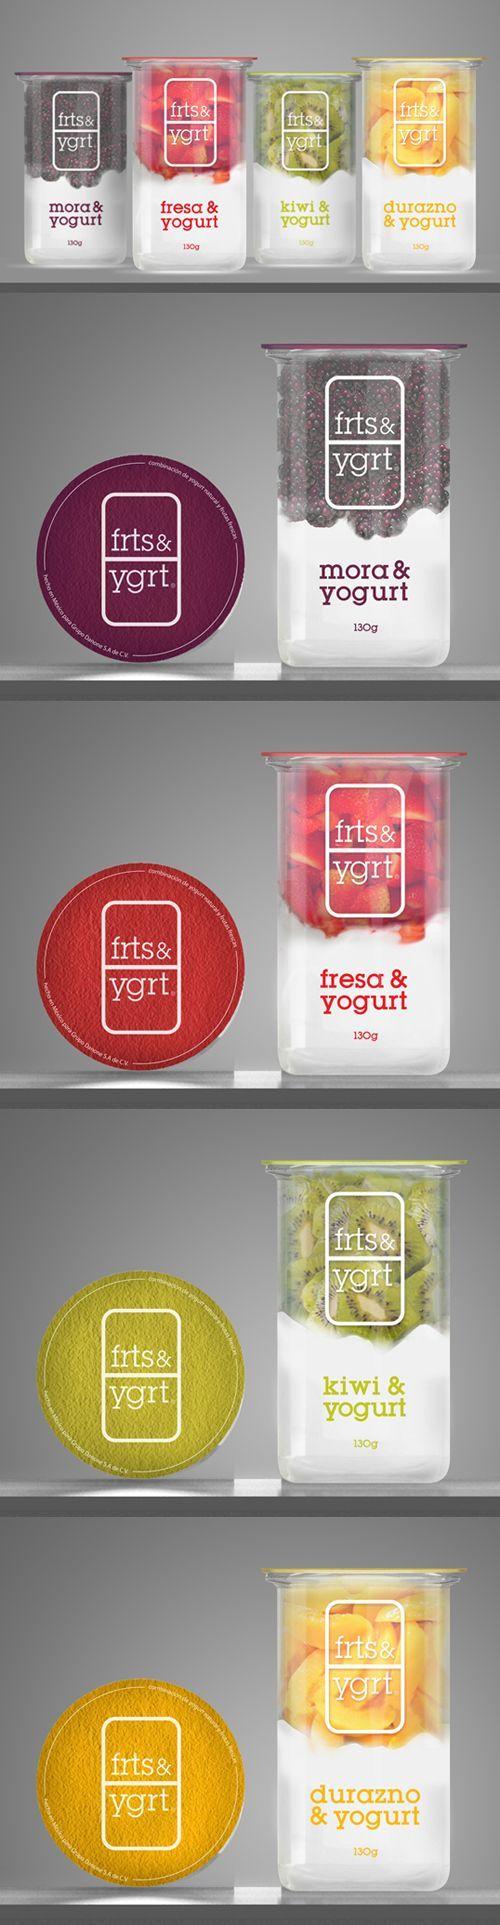 Fruit Yogurt Designed by Mika Kañive PD